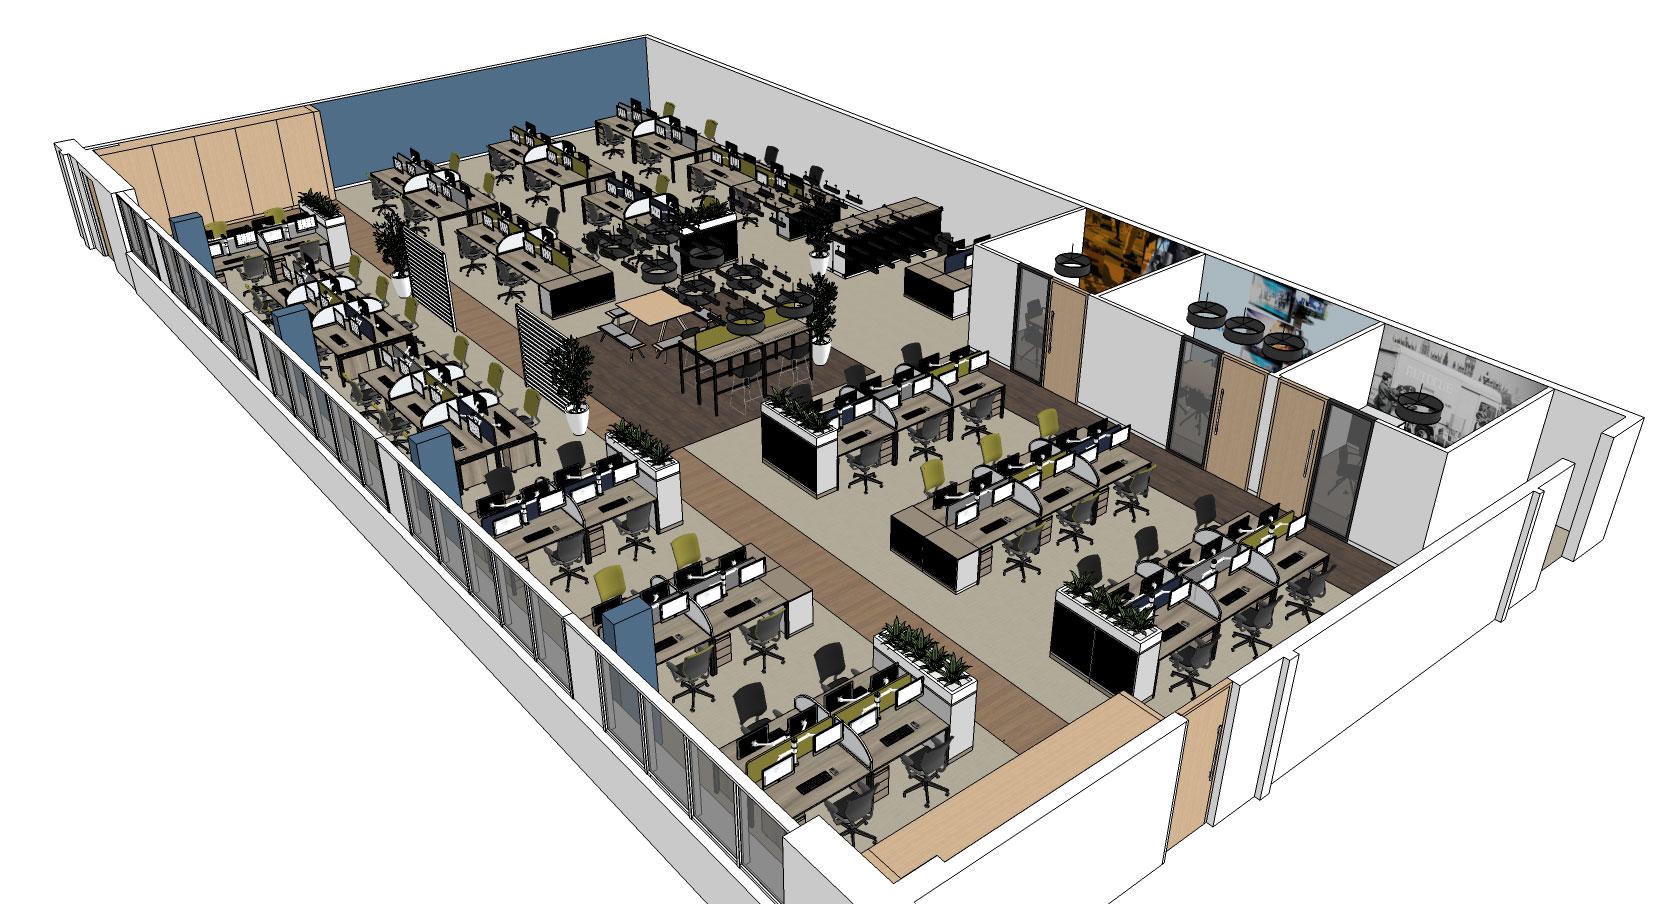 vitec first floor visual